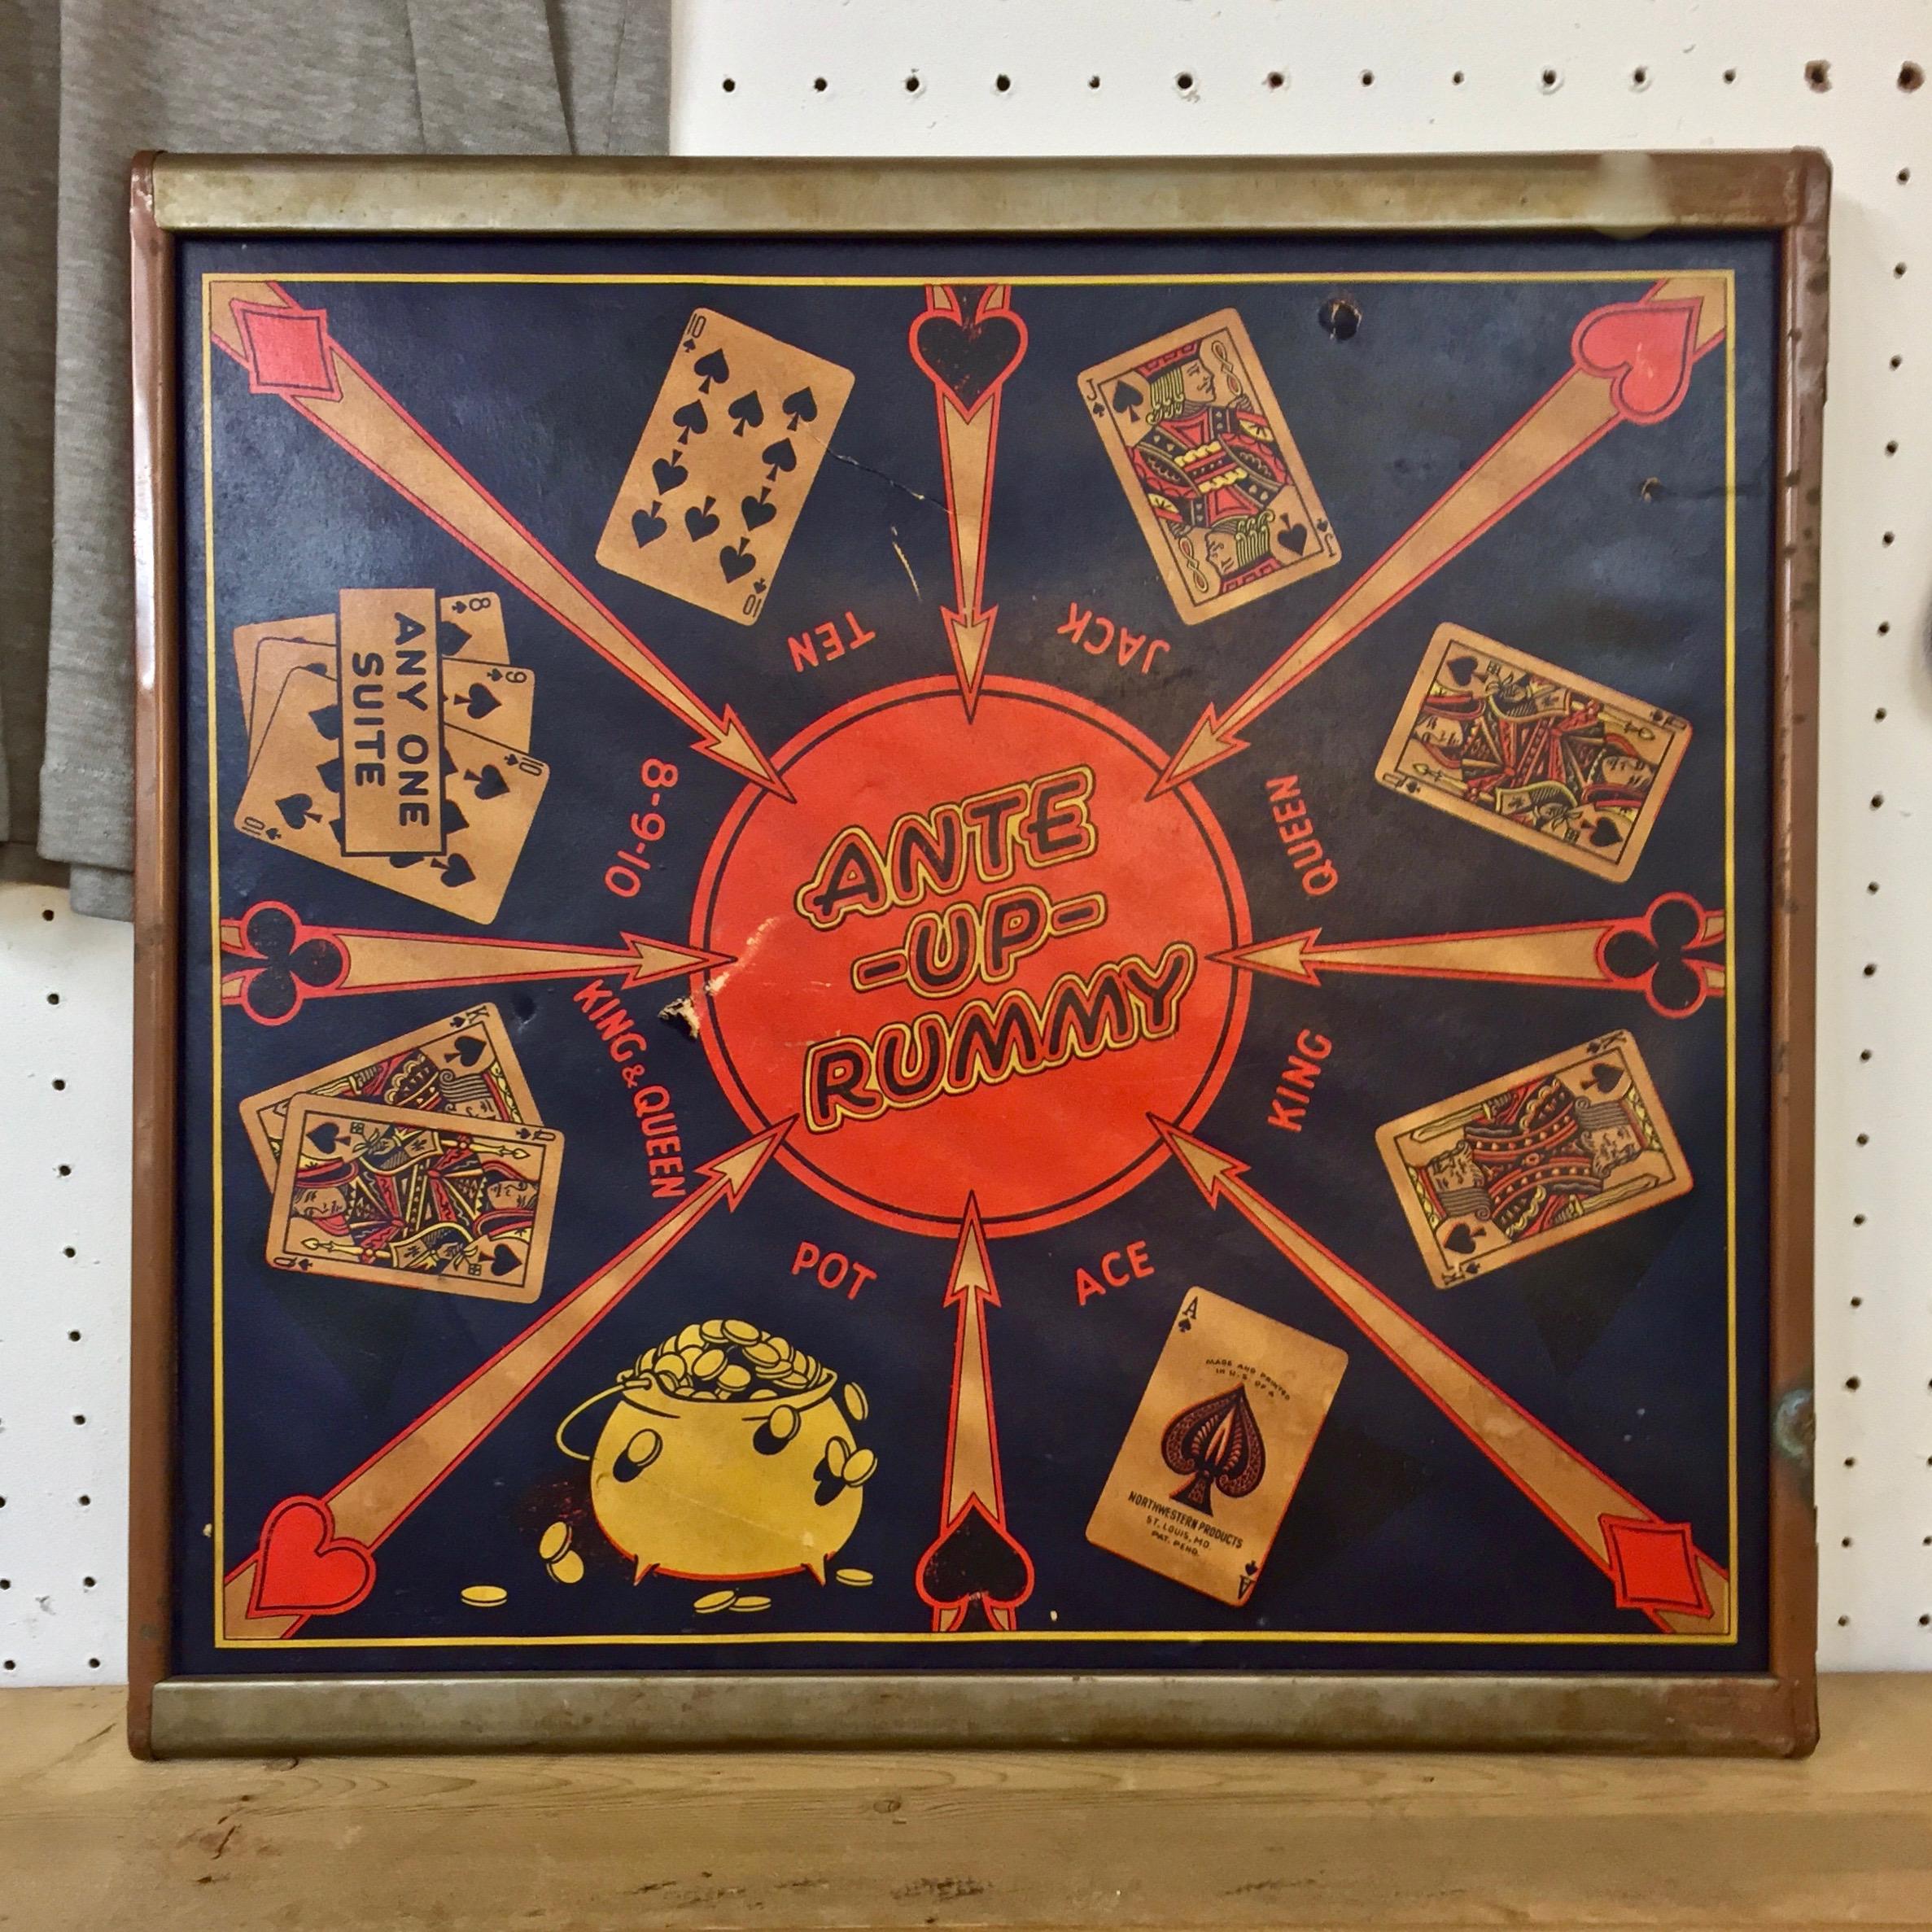 Vintage Rummy Board Game